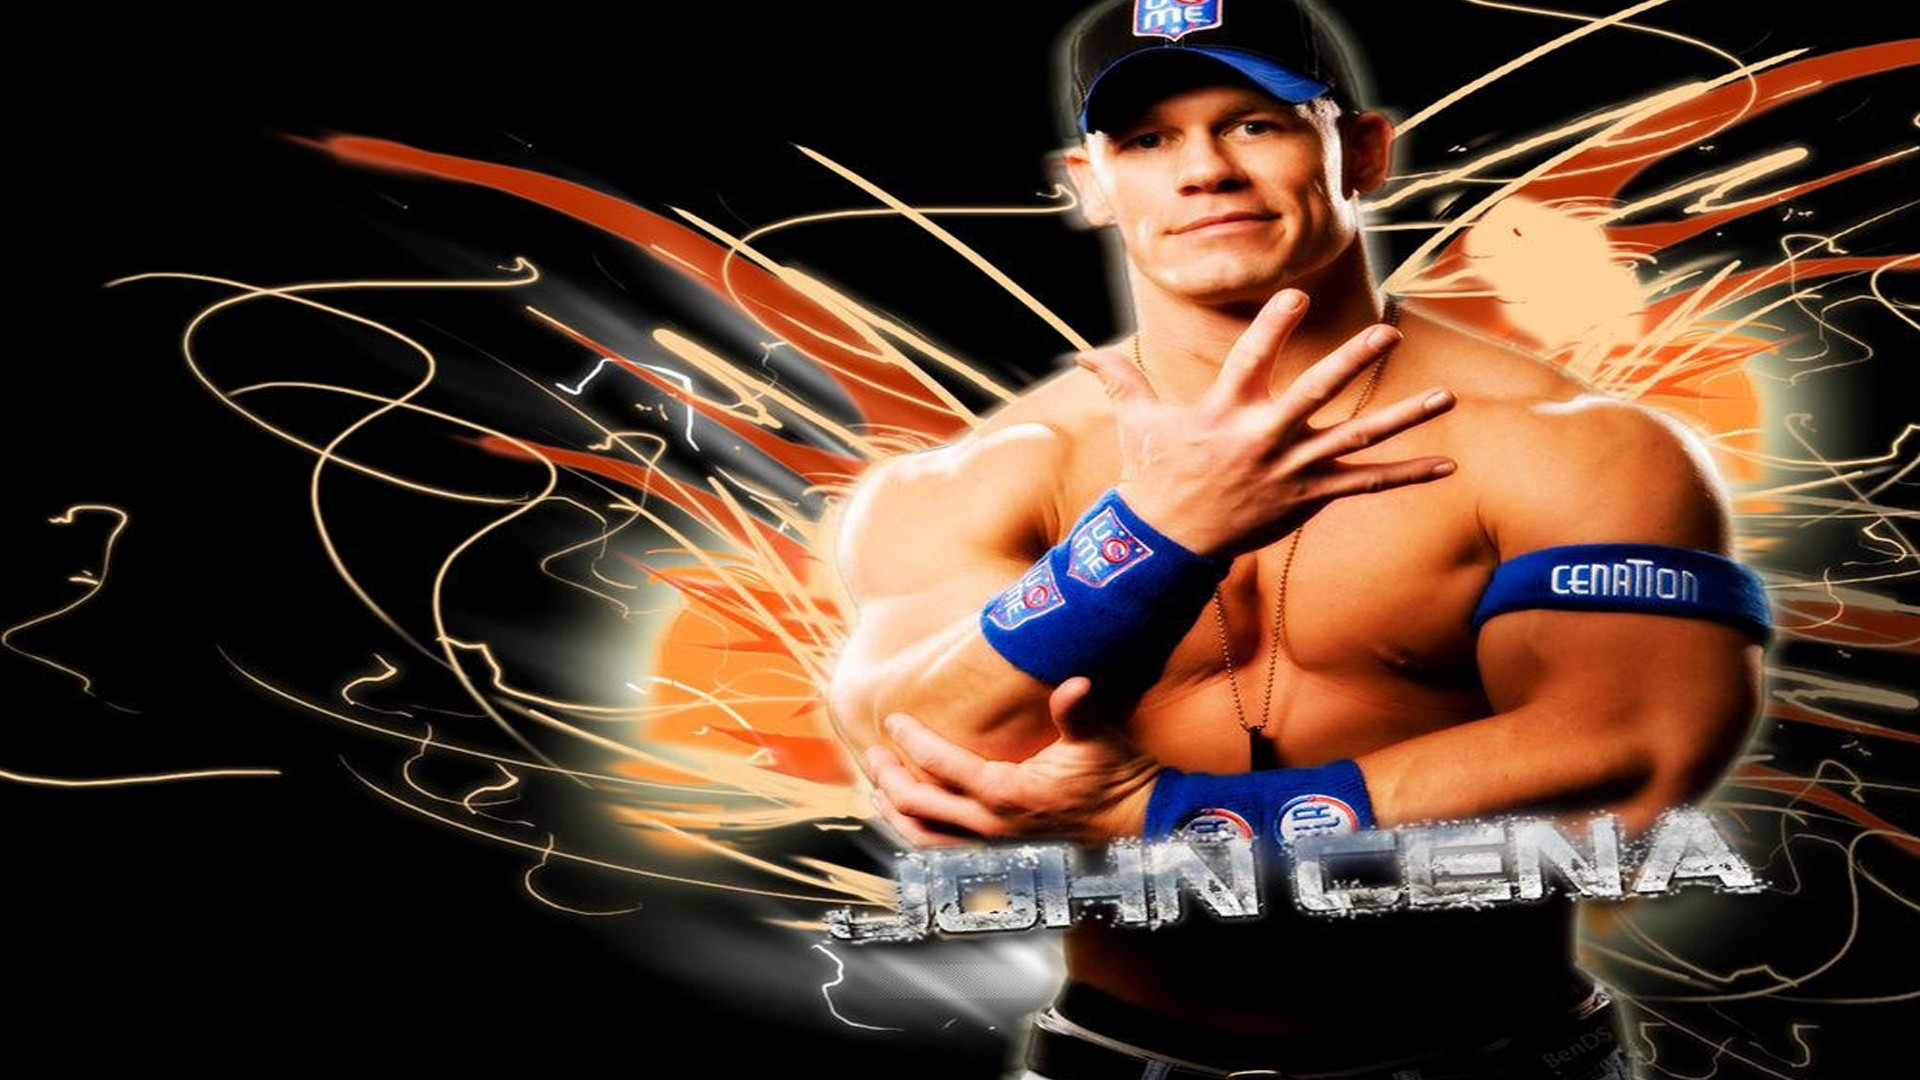 WWE John Cena Mobile Wallpapers 2018 (50+ images)